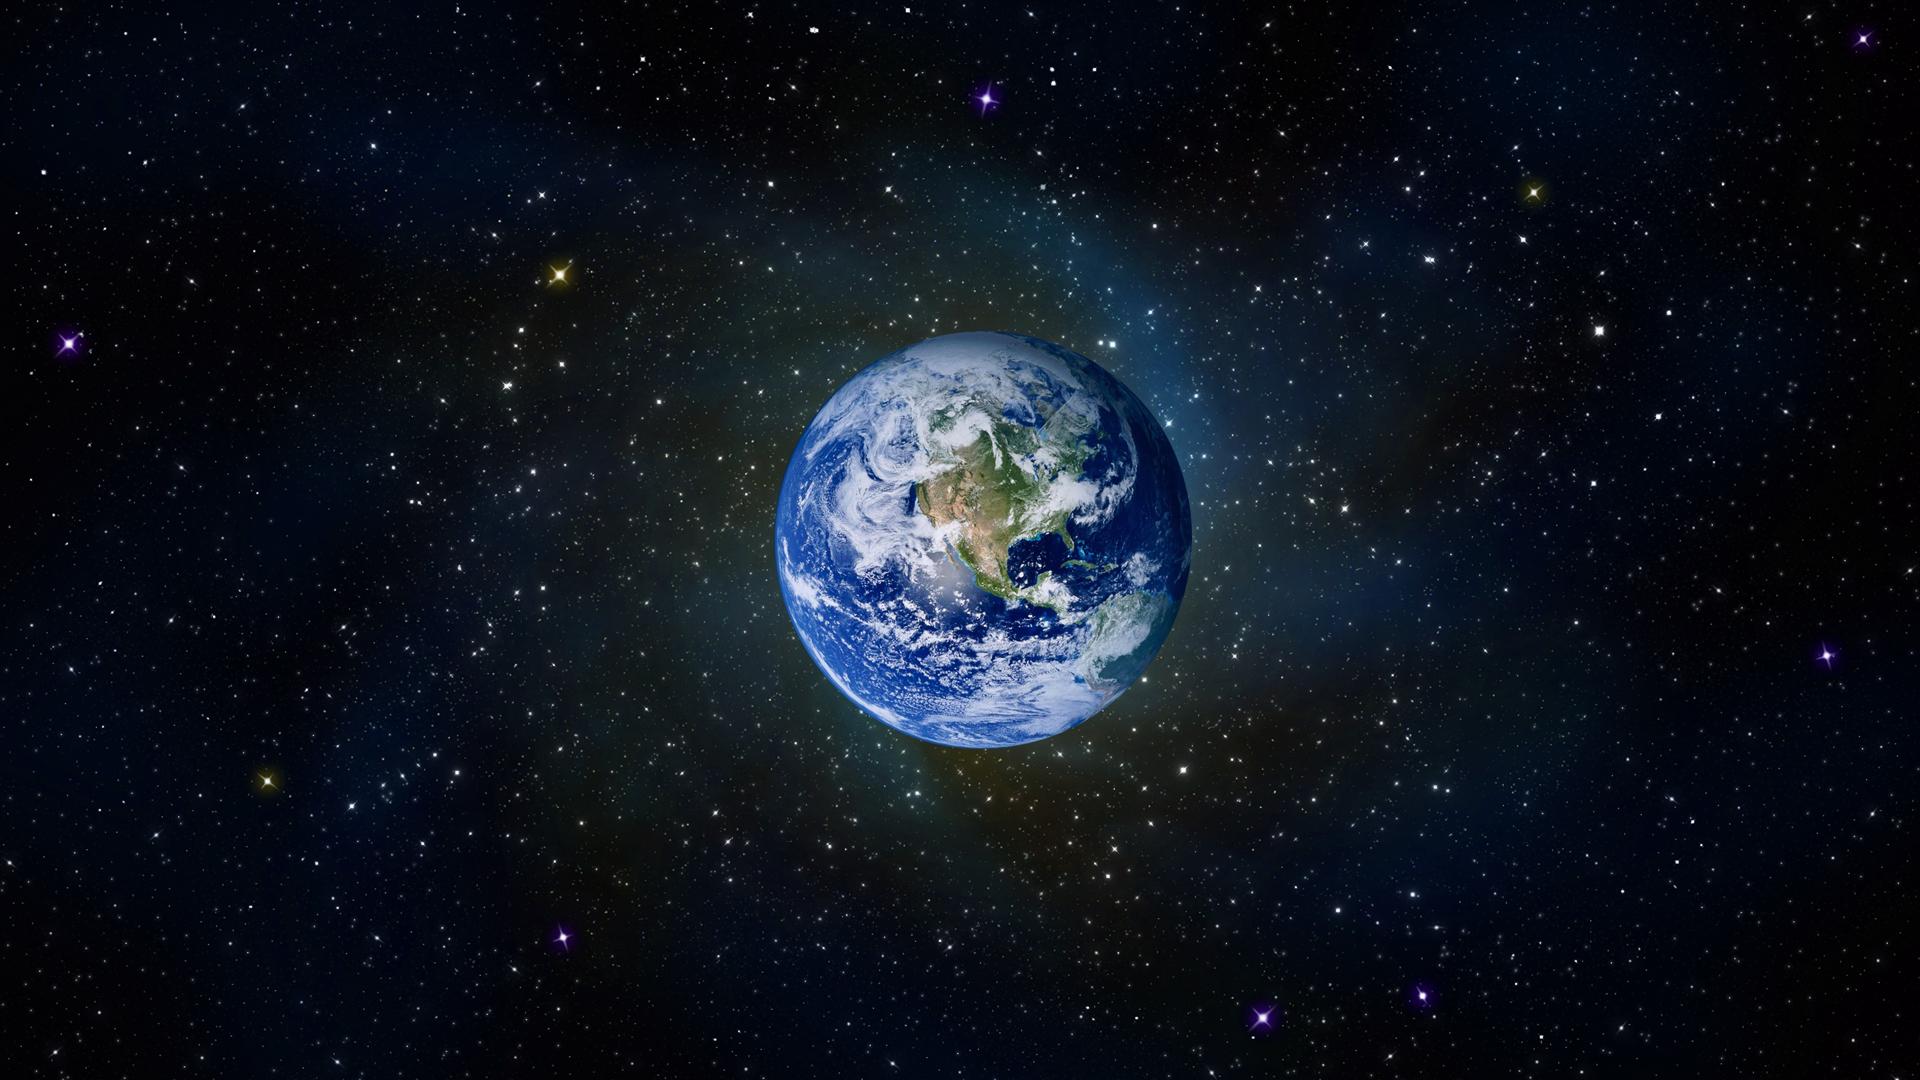 Space HD Desktop Wallpaper   Pics about space 1920x1080